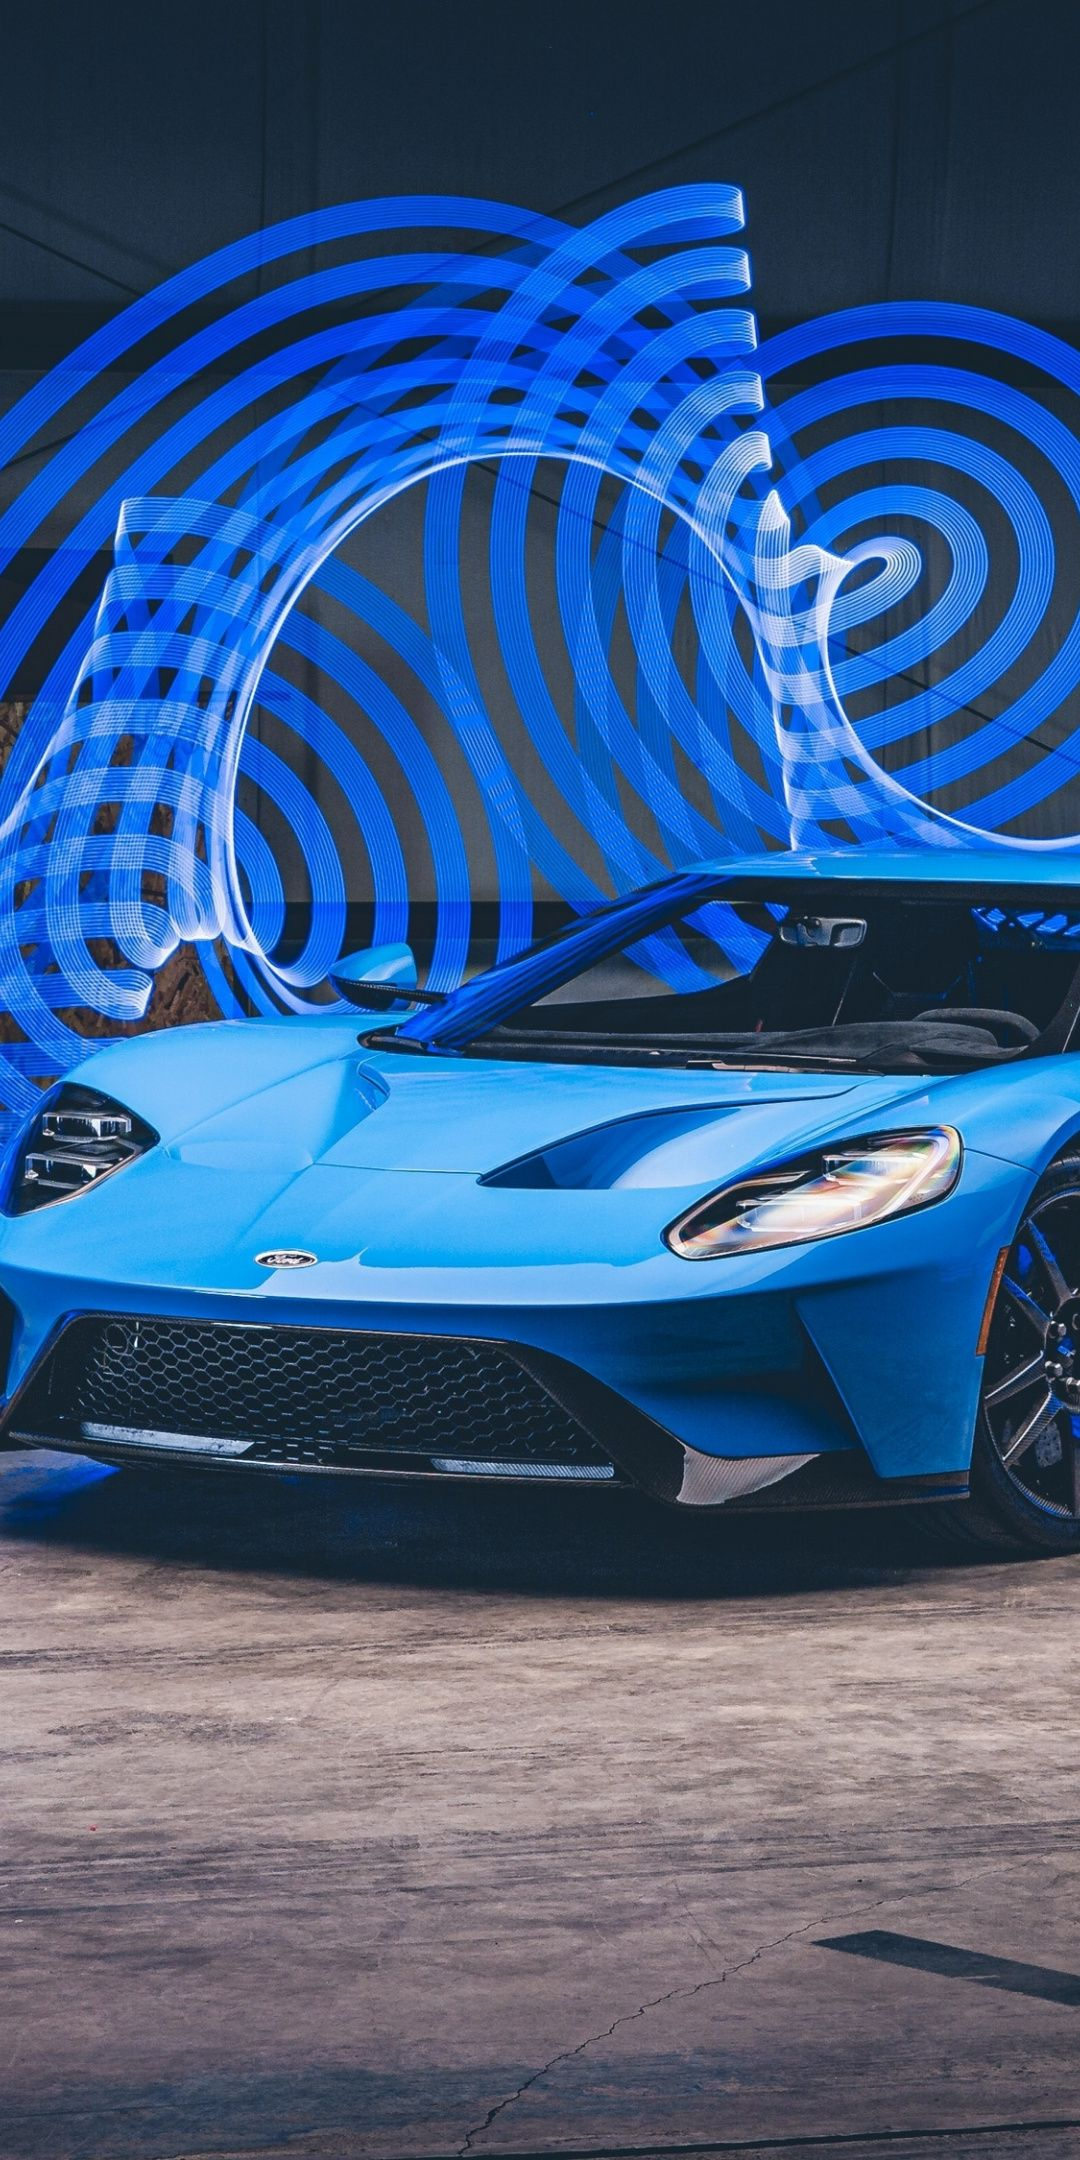 1080x2160 Ford Gt Blue Sportcar 2020 Wallpaper Ford Gt Ford Gt Wallpapers 2020 Wallpaper